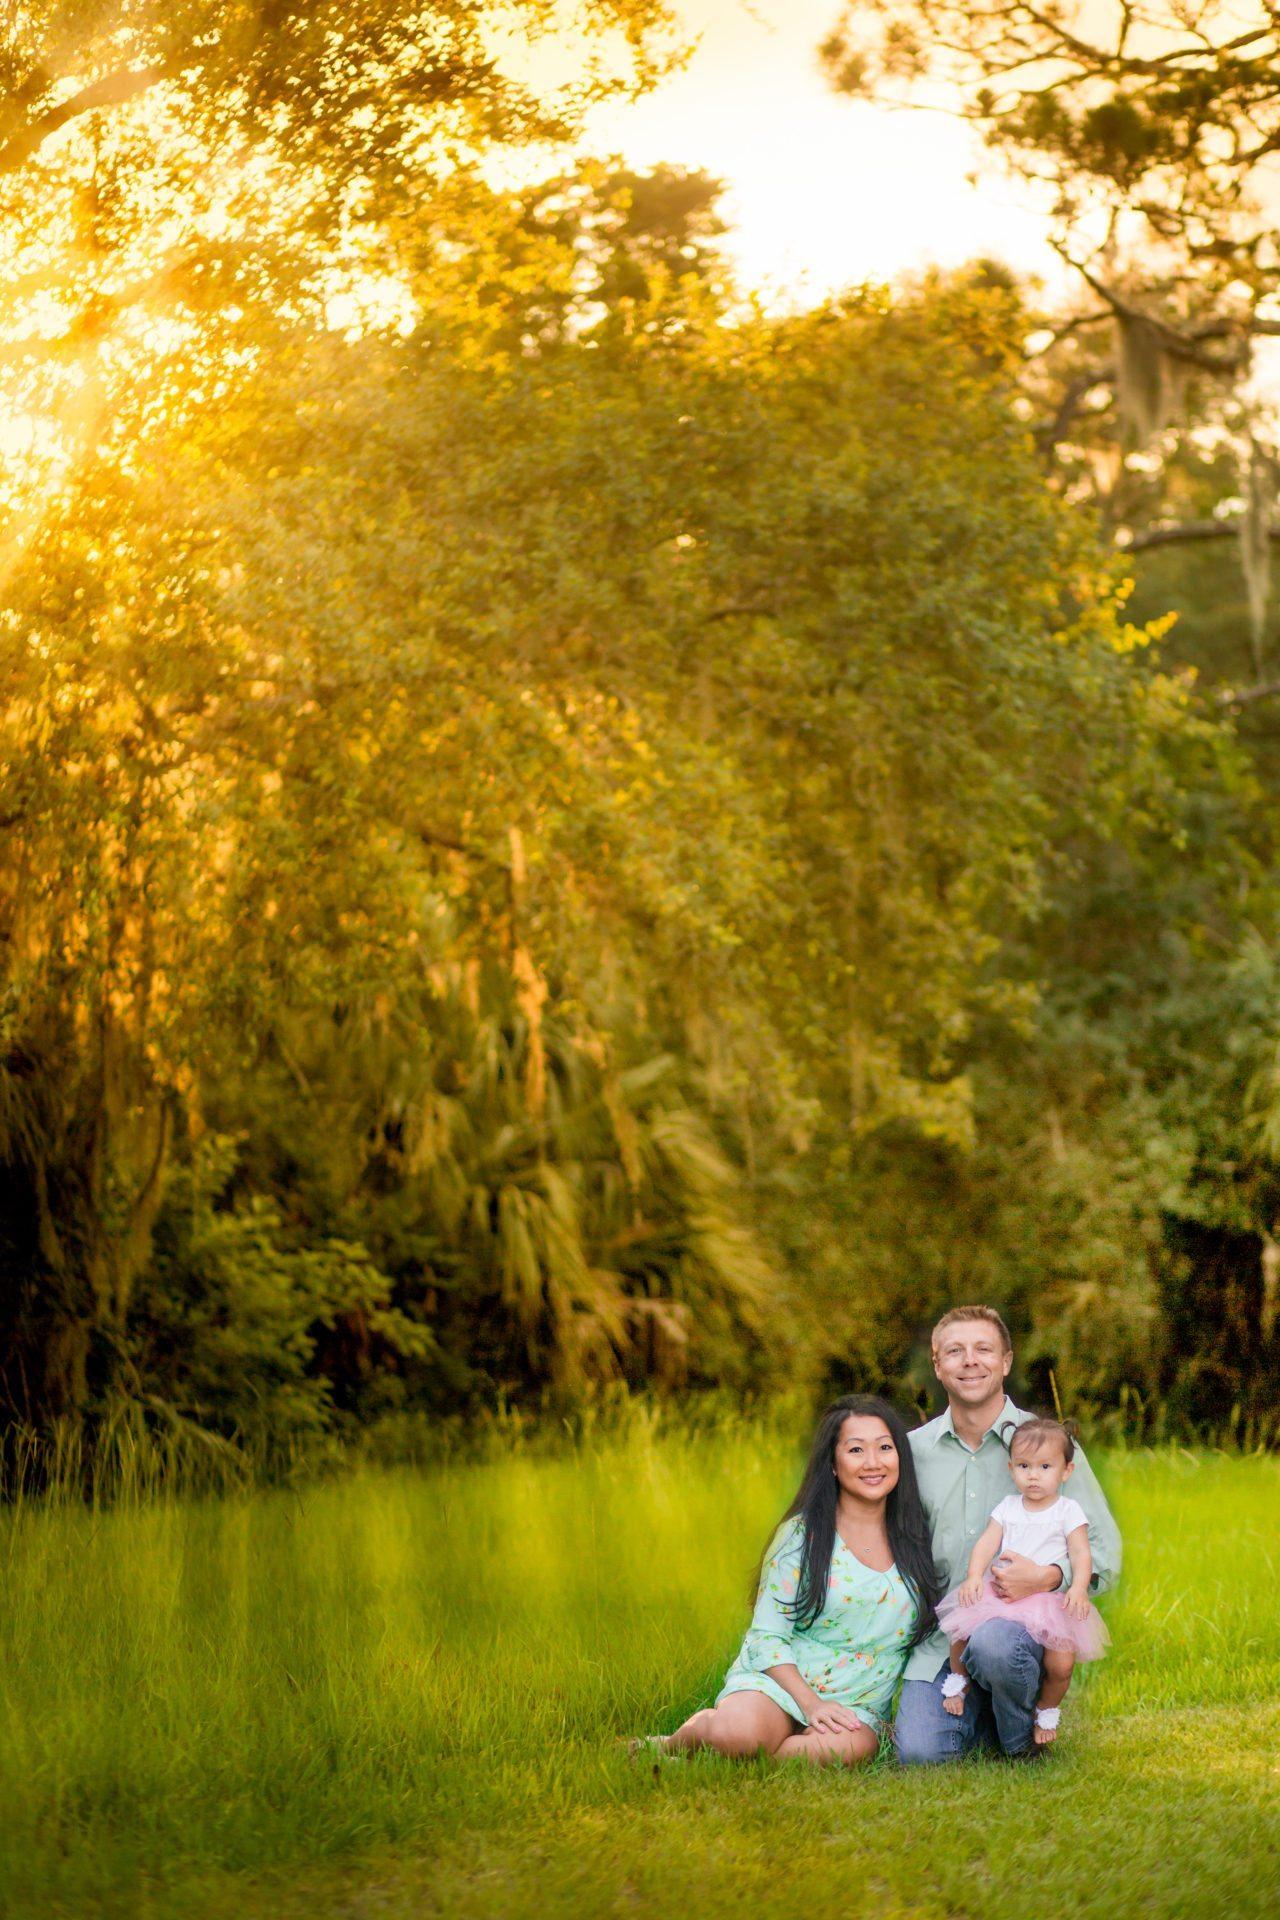 photographers in new smyrna beach, orlando family photographer, Daytona Beach professional photographer, Central Florida Photographer, St. Augustine Photographer